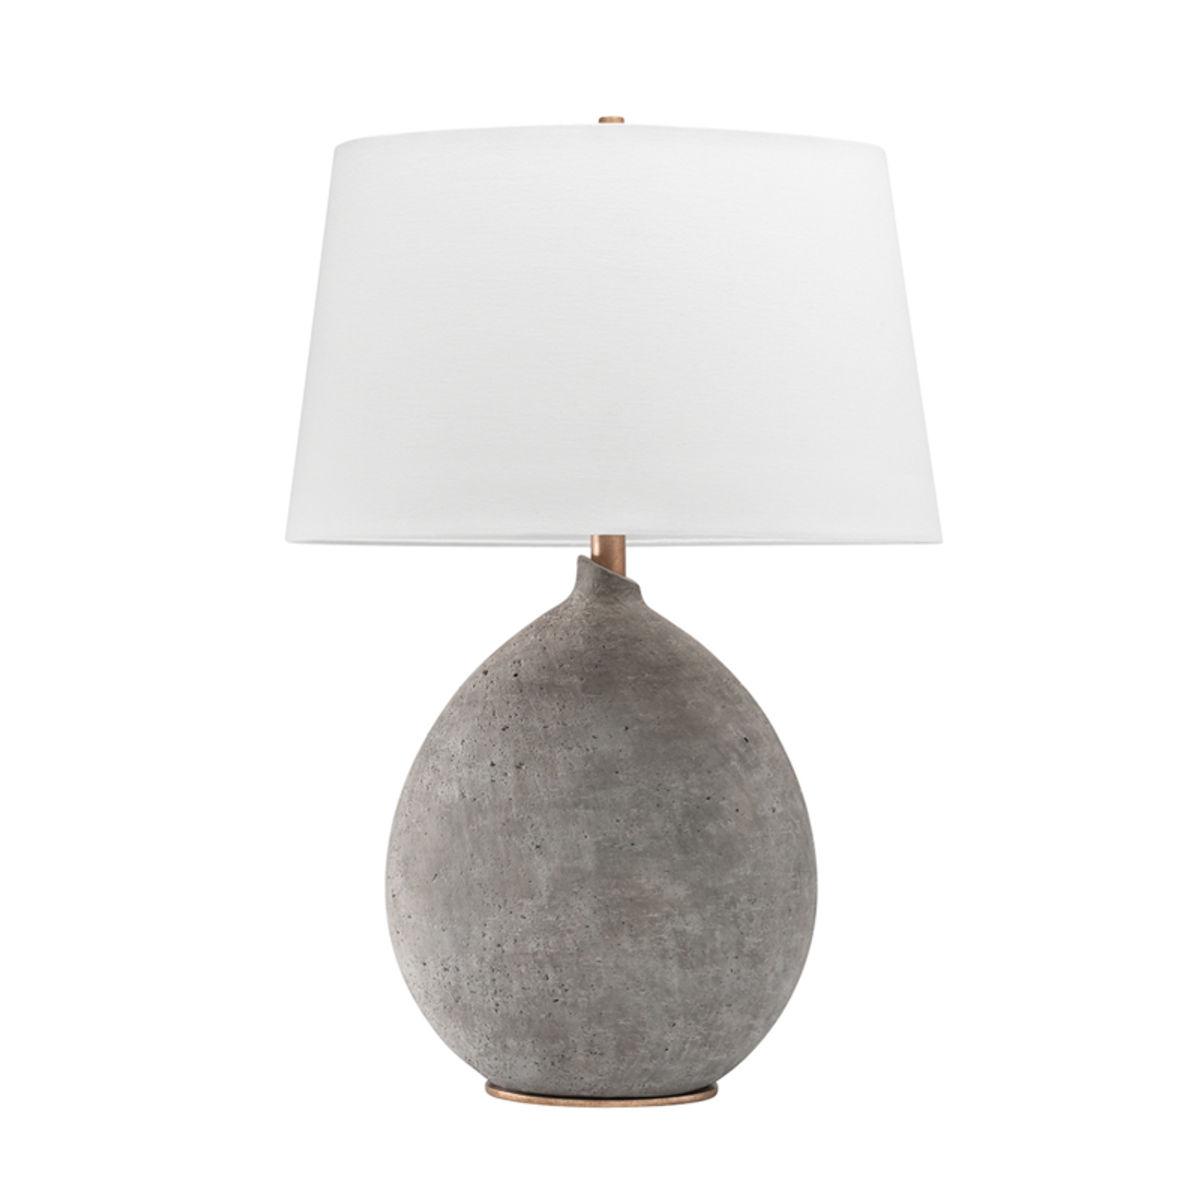 Denali Table Lamp, Gray